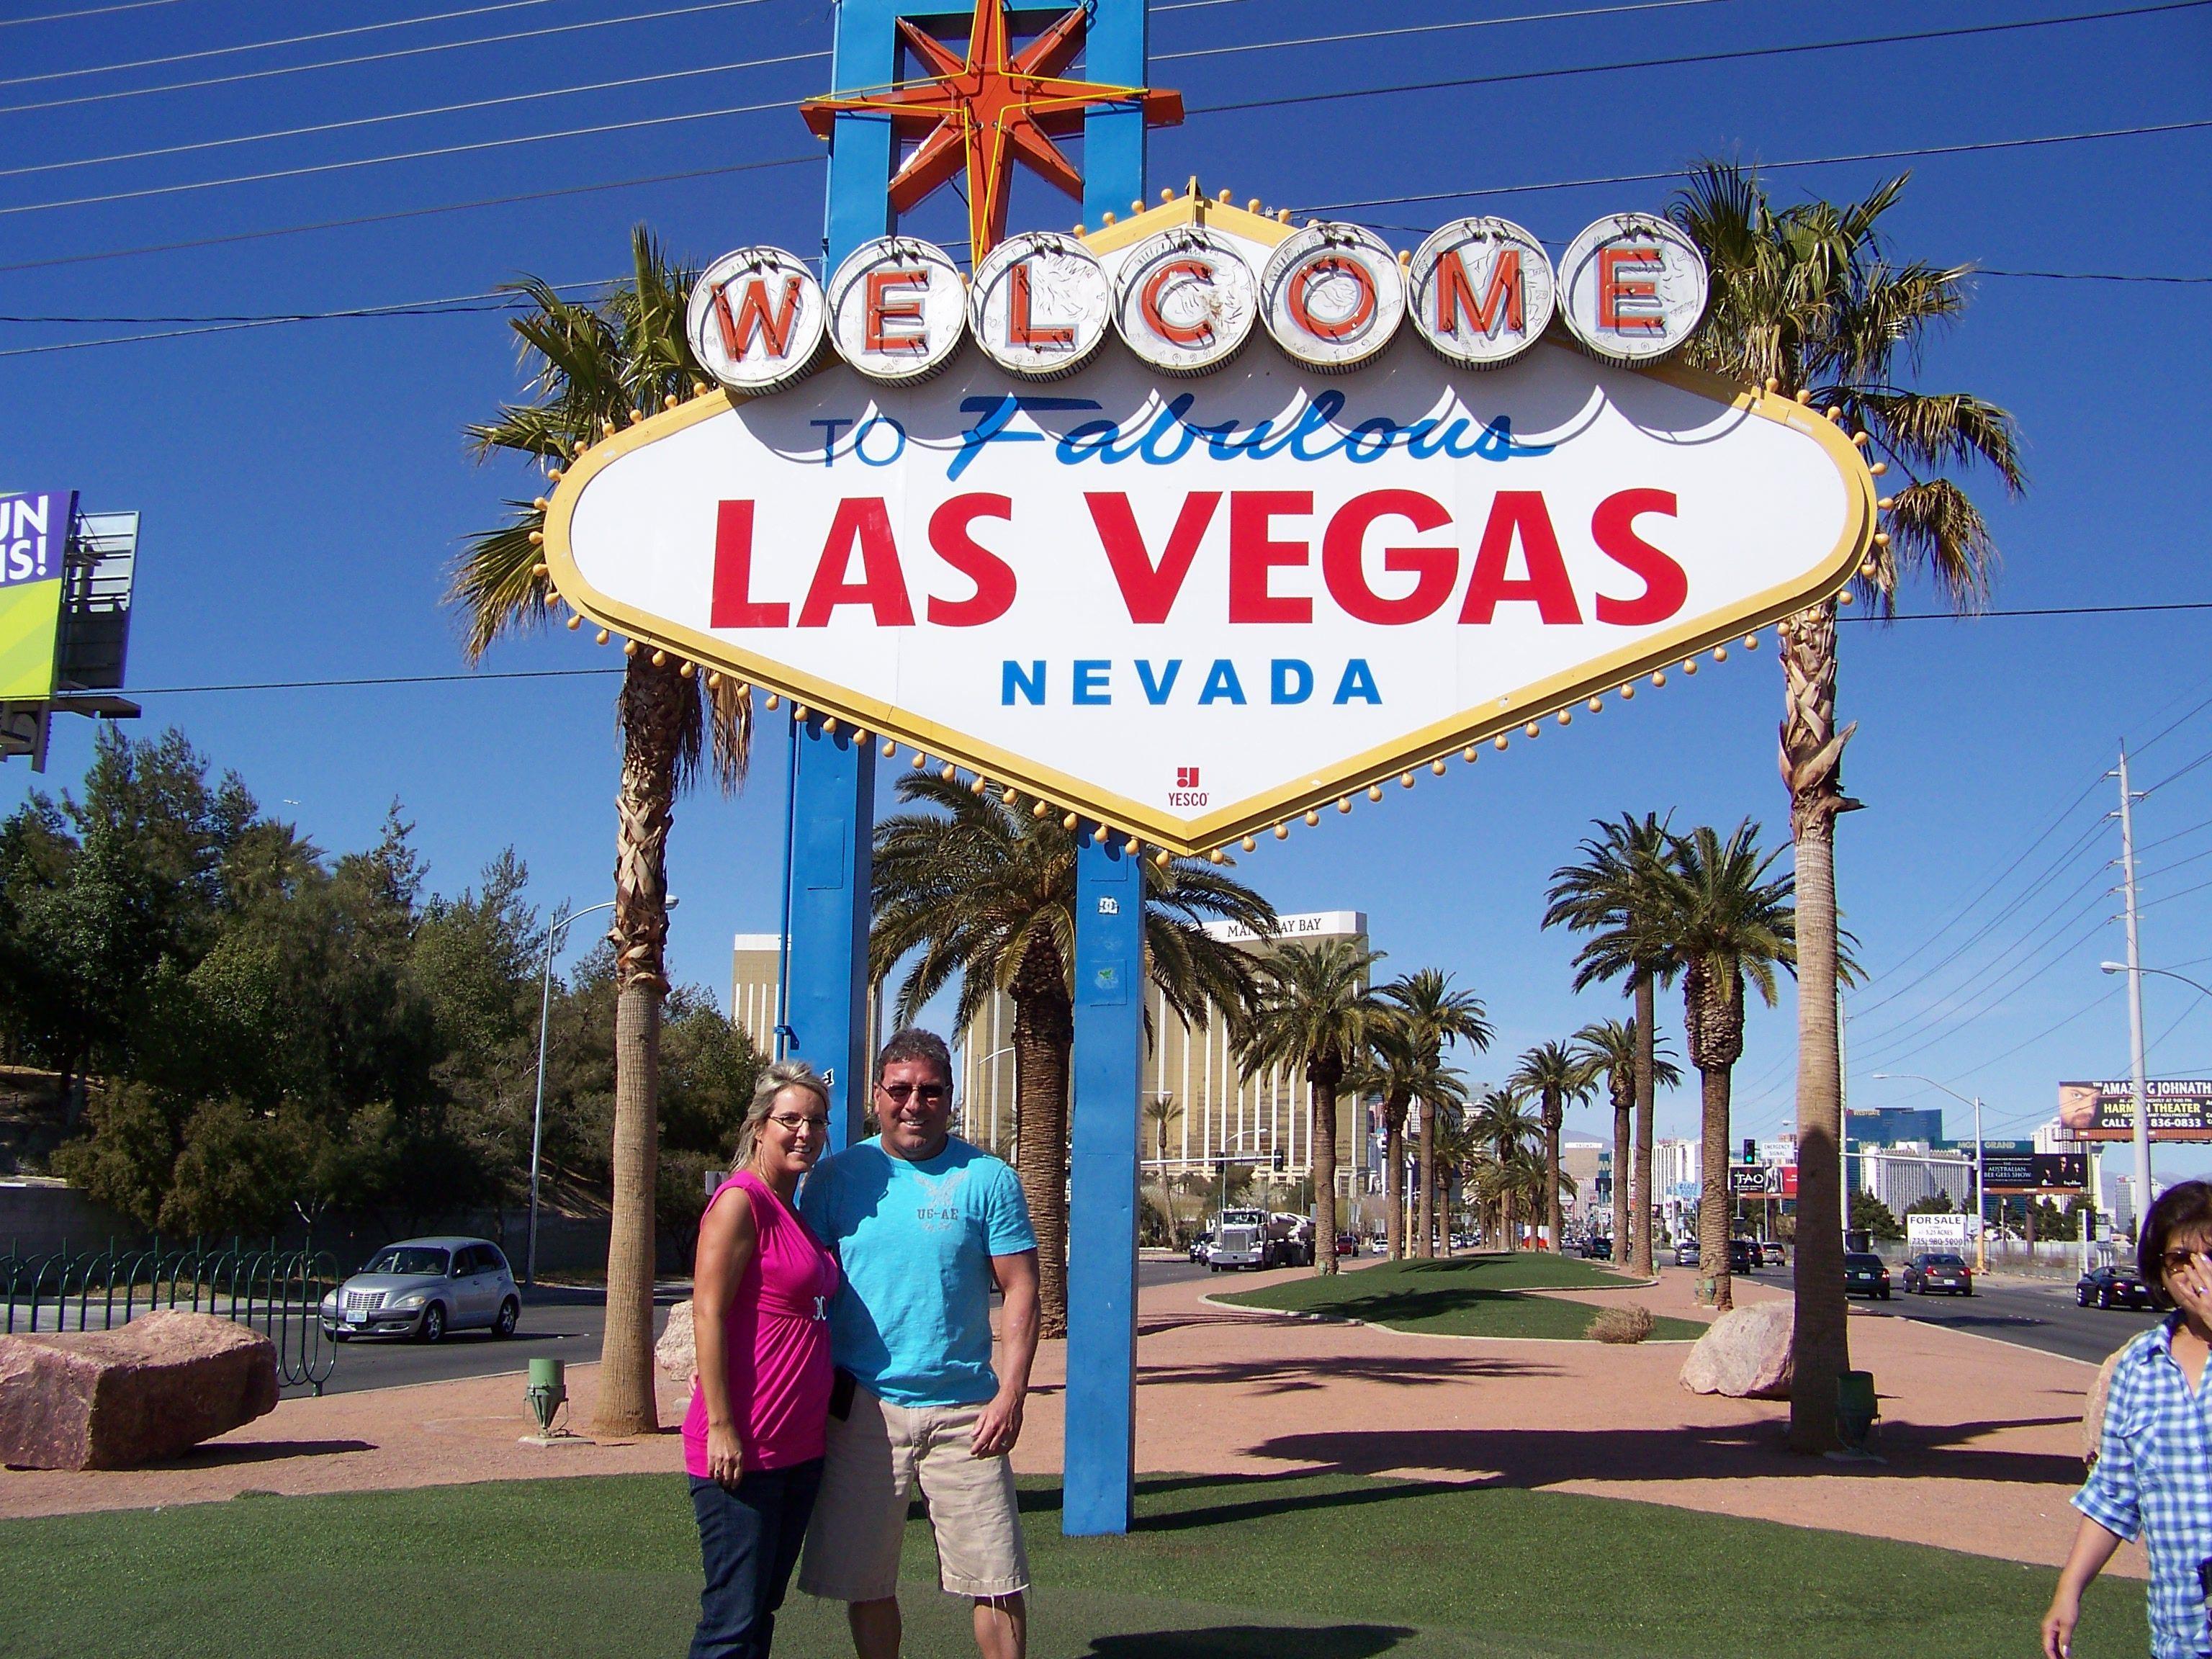 Las Vegas Nv 've . Sign Visit